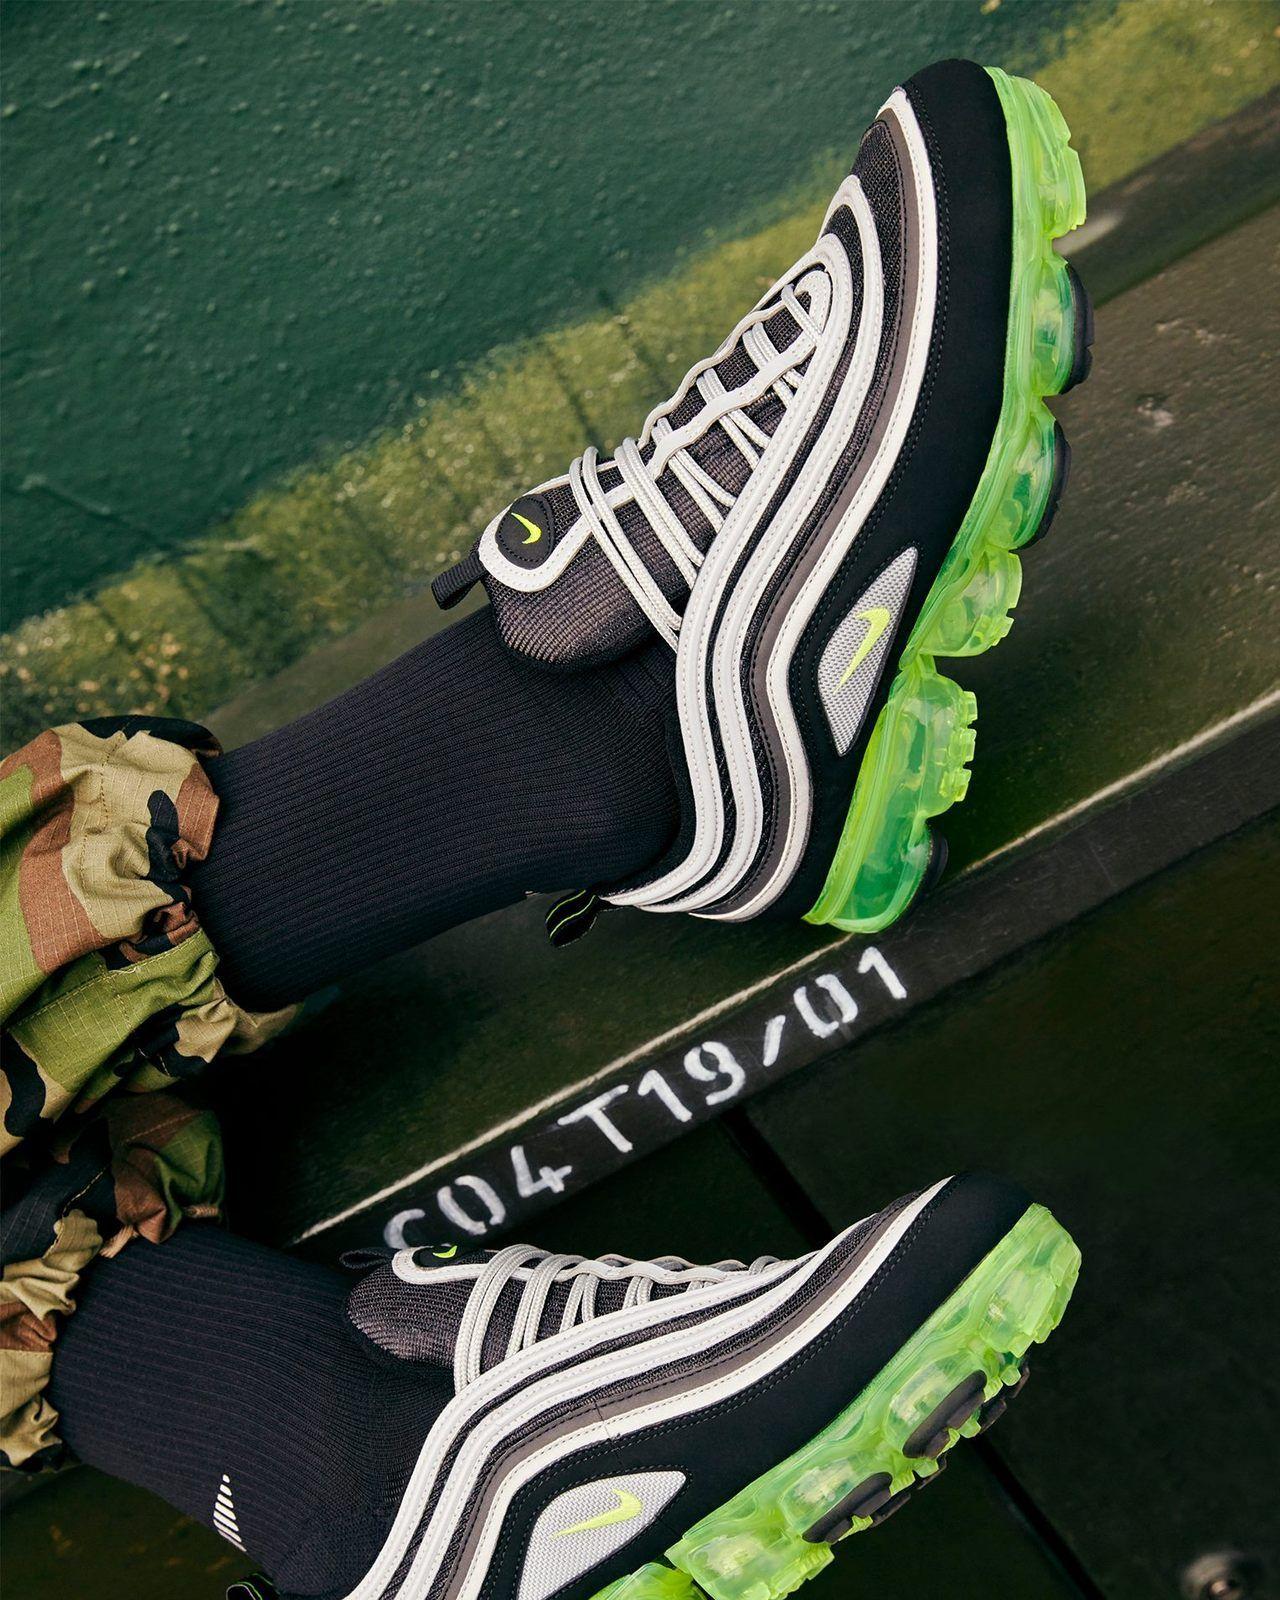 reputable site 42267 81c0d Nike Air VaporMax '97 'Japan' @ SNS | Footwear | Sneakers ...